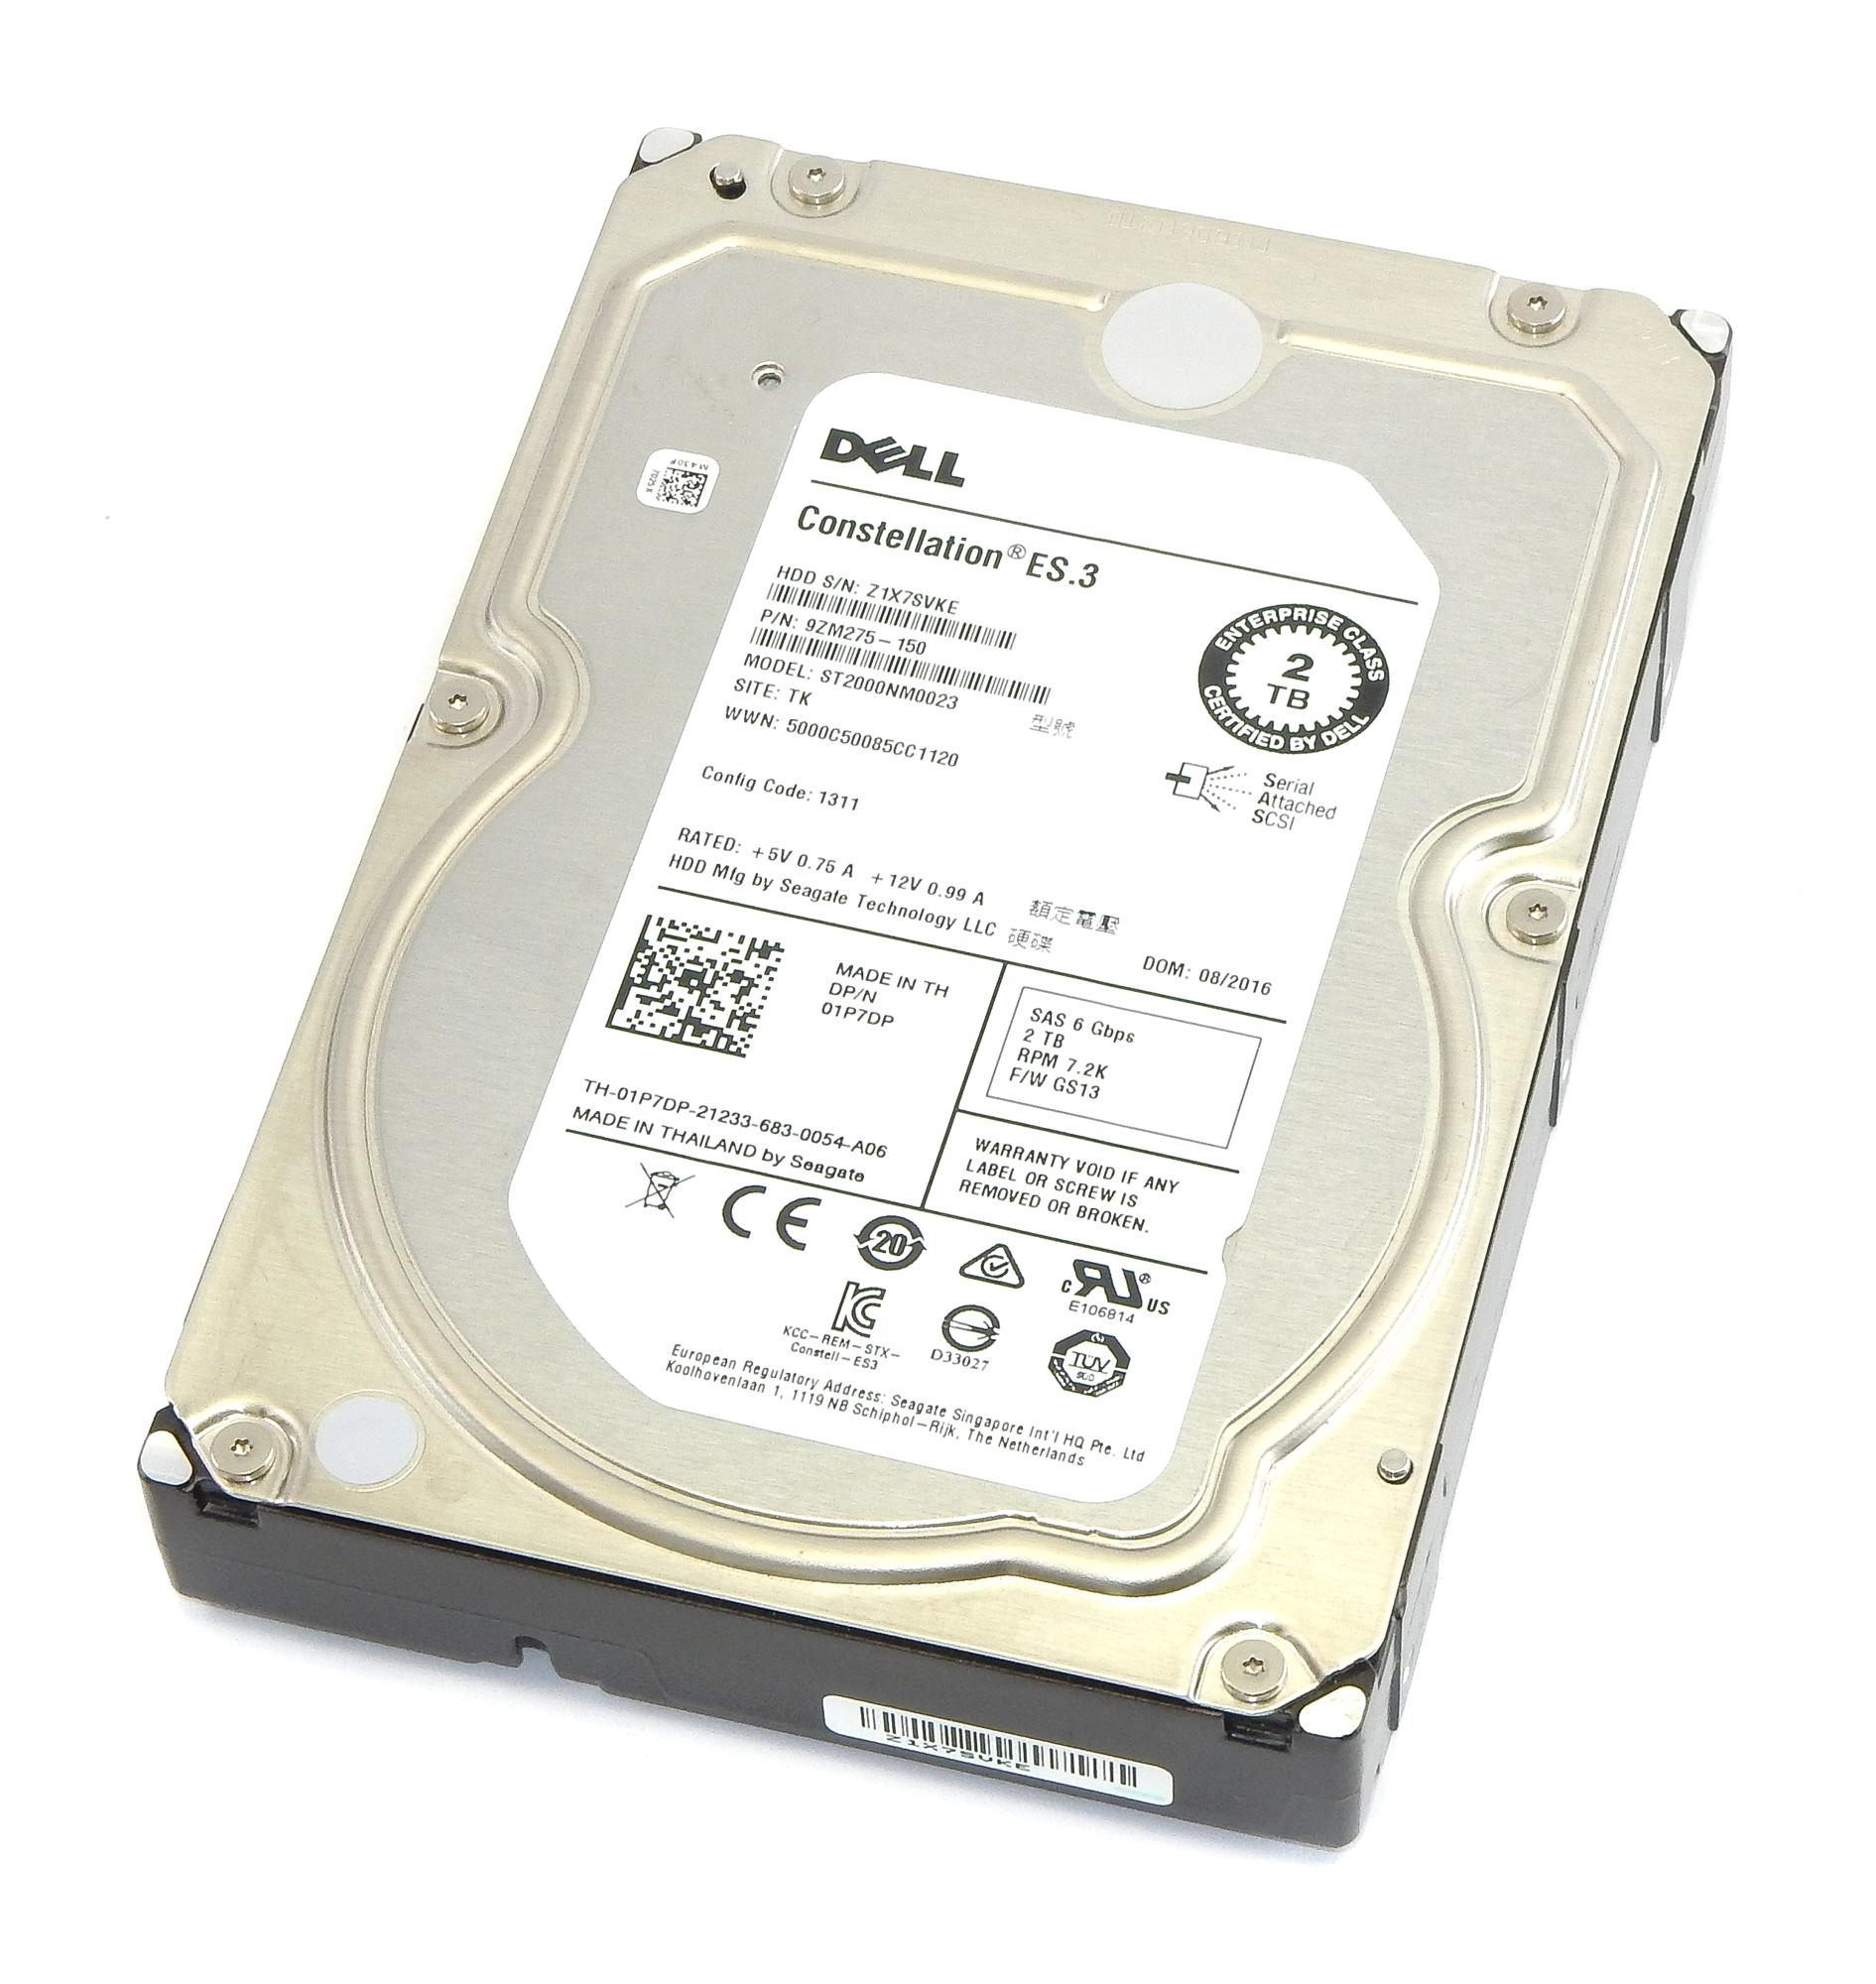 "Dell 1P7DP Constellation ES.3 2TB SAS 3.5"" SAS Hard Drive - Seagate ST2000NM0023"